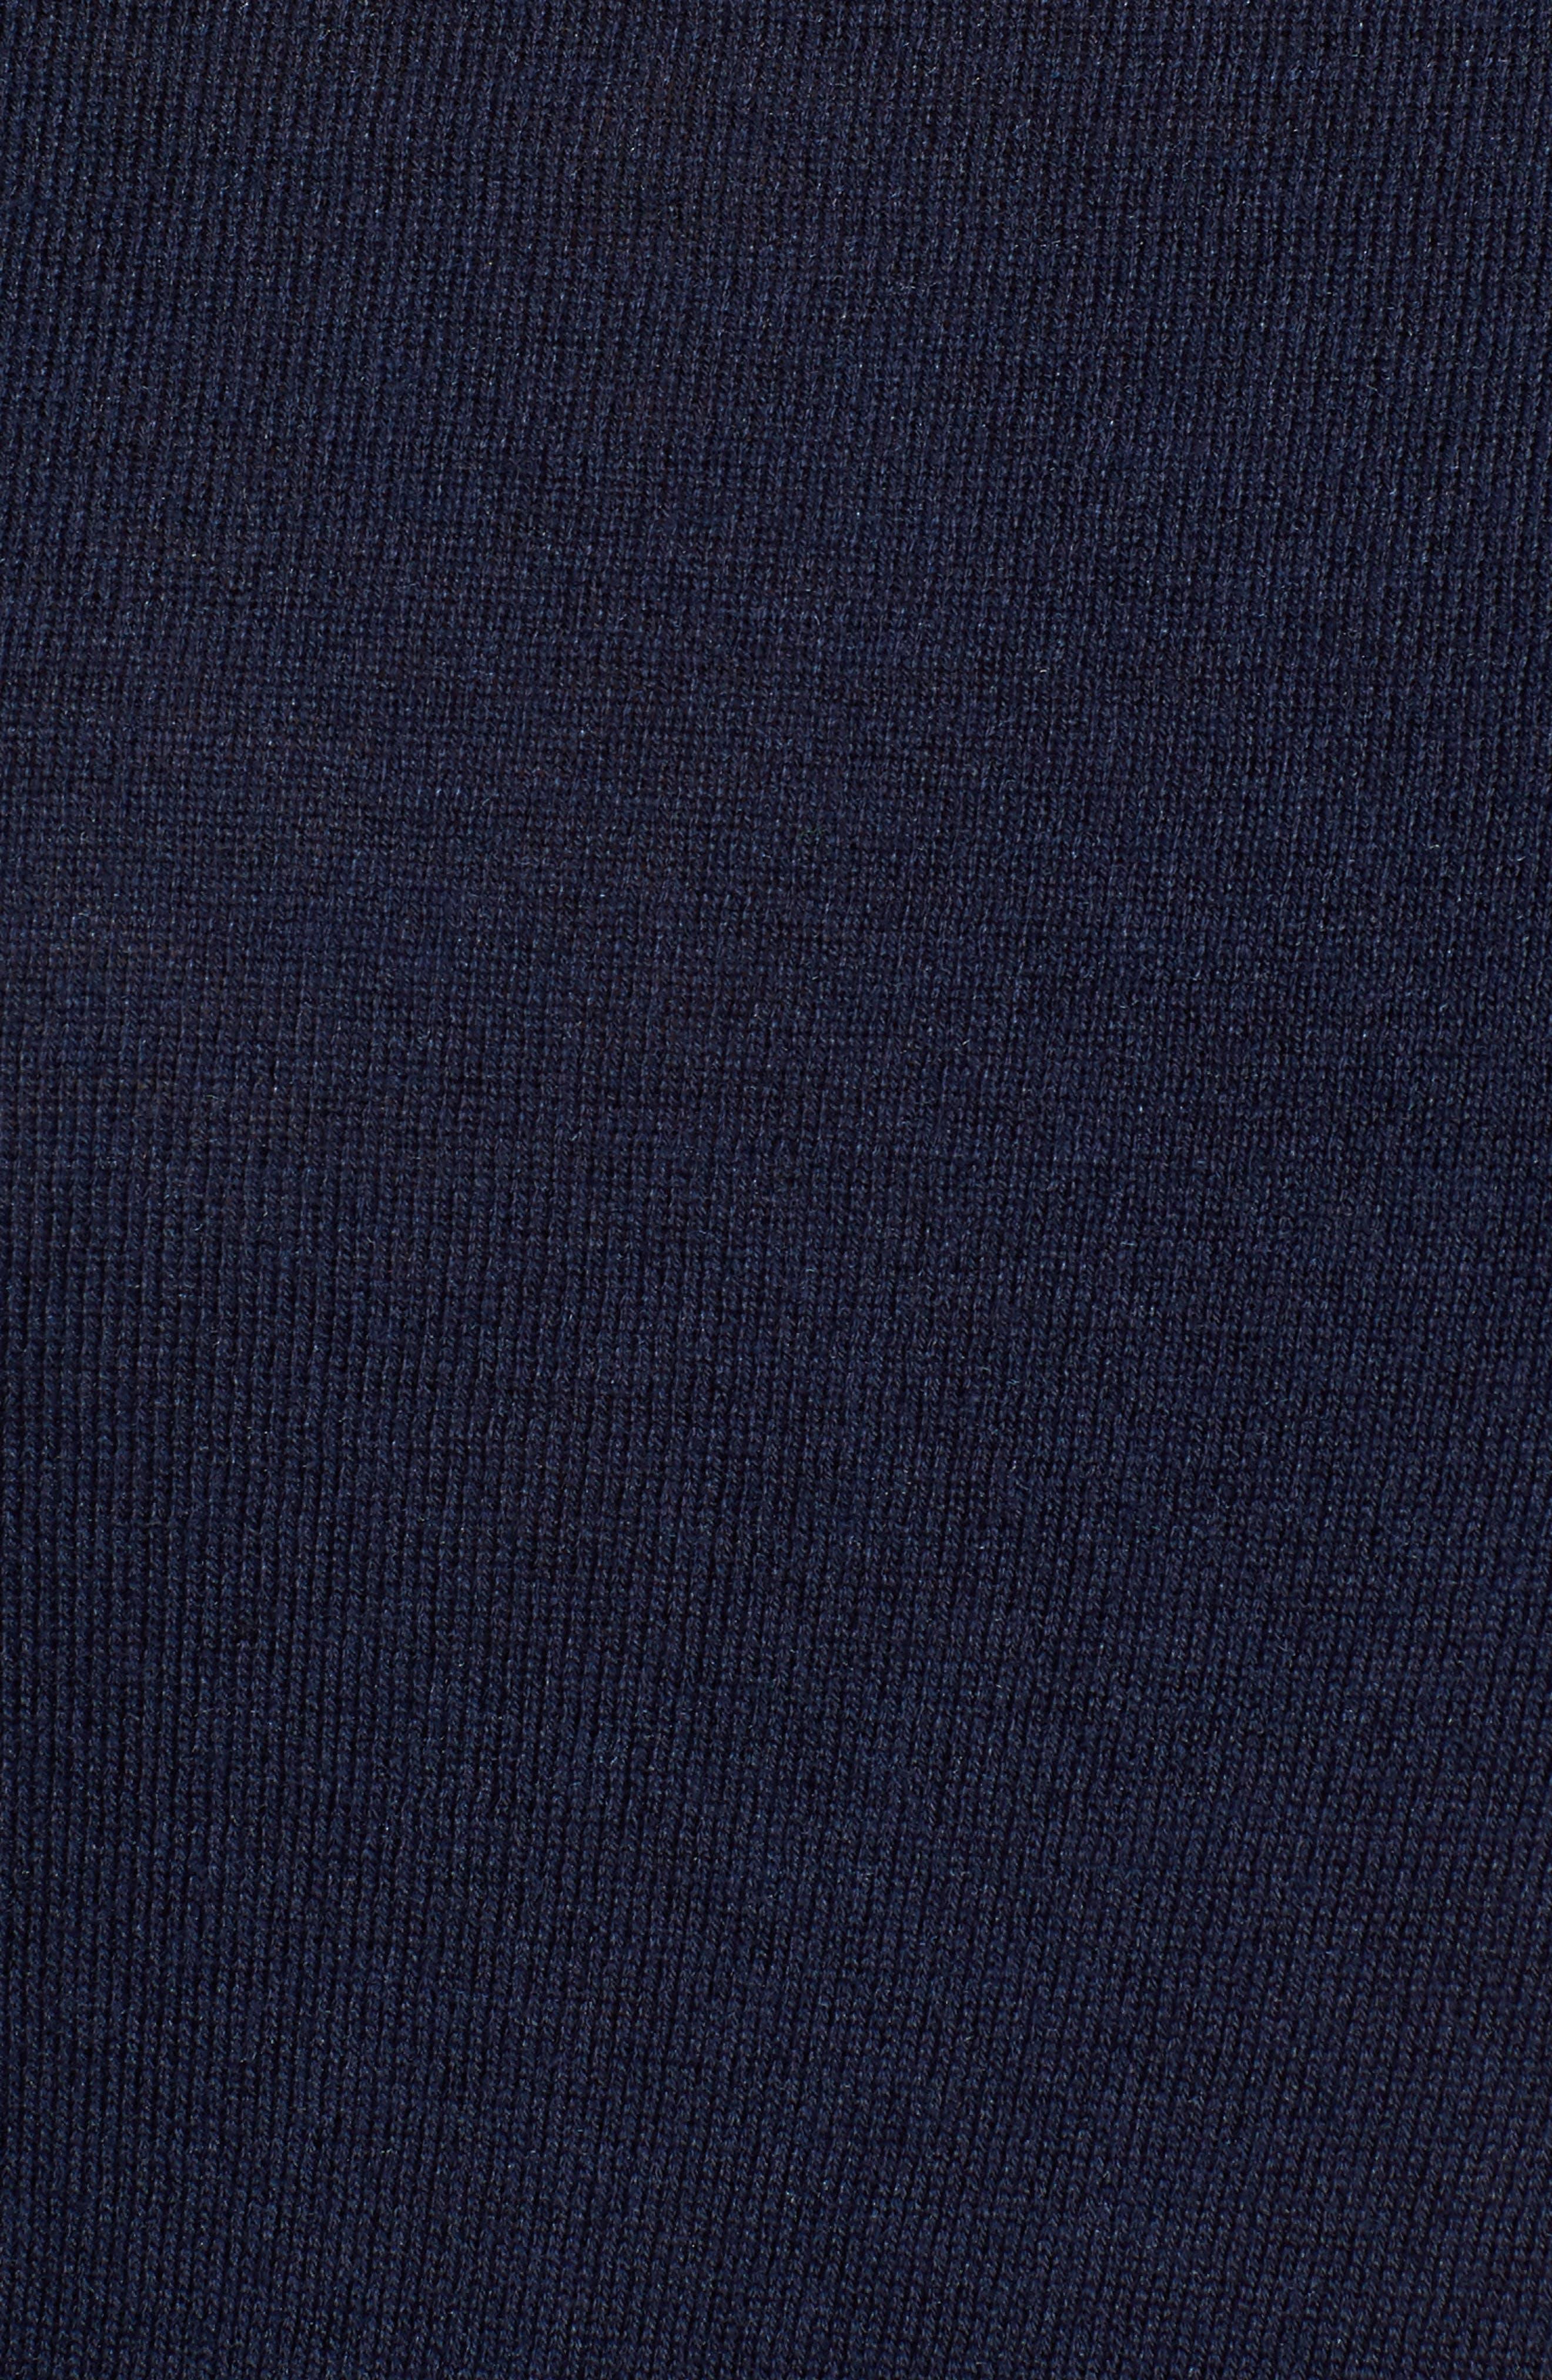 Crewneck Sweater,                             Alternate thumbnail 43, color,